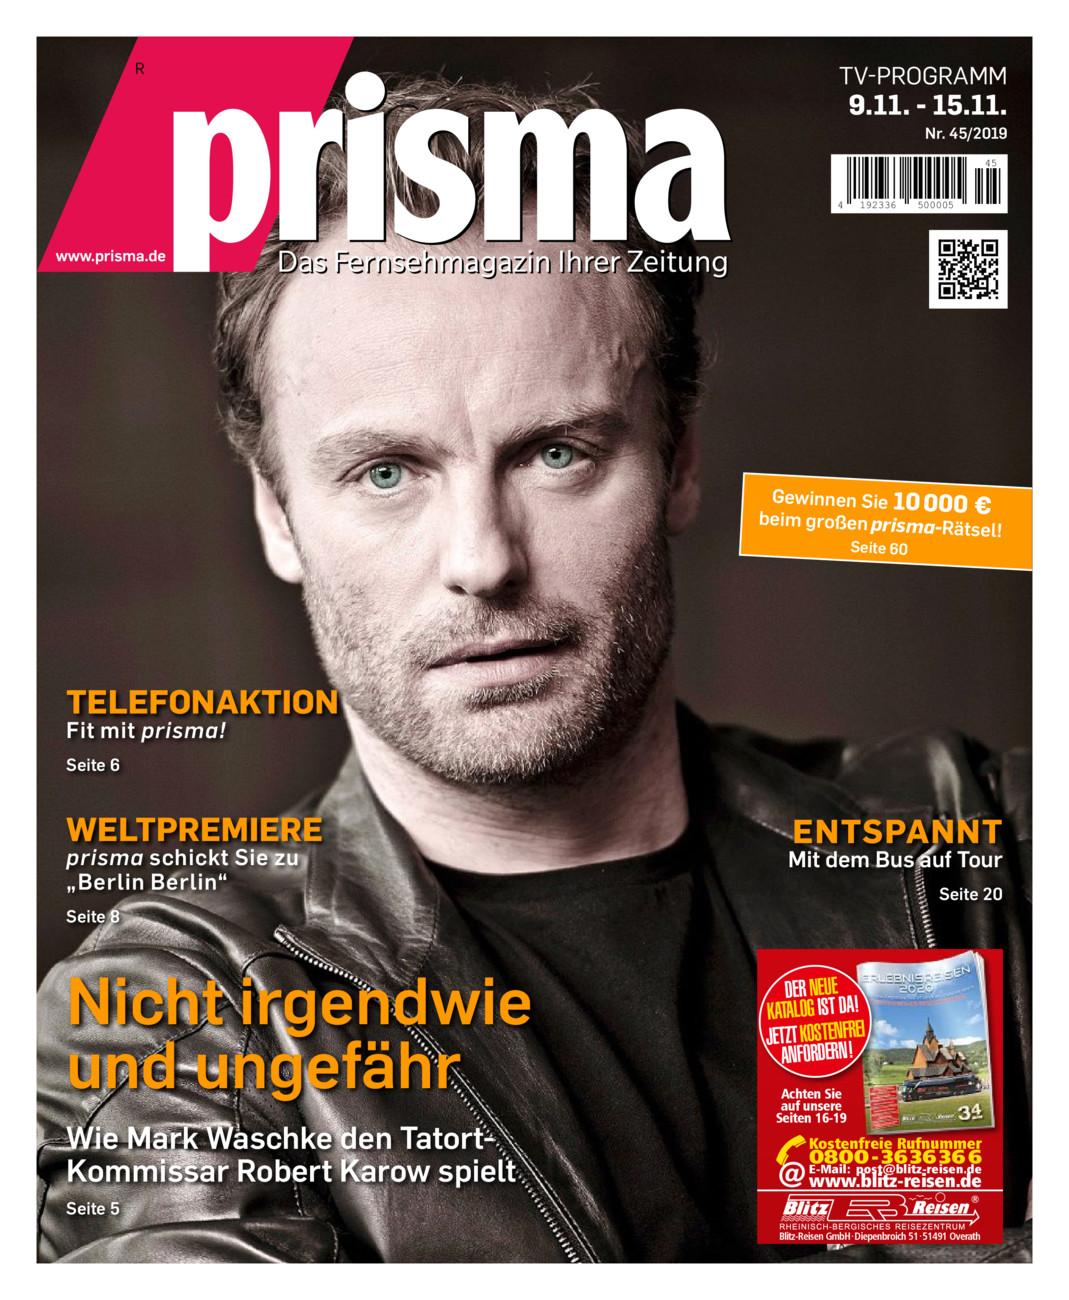 Prisma 09.11. - 15.11.